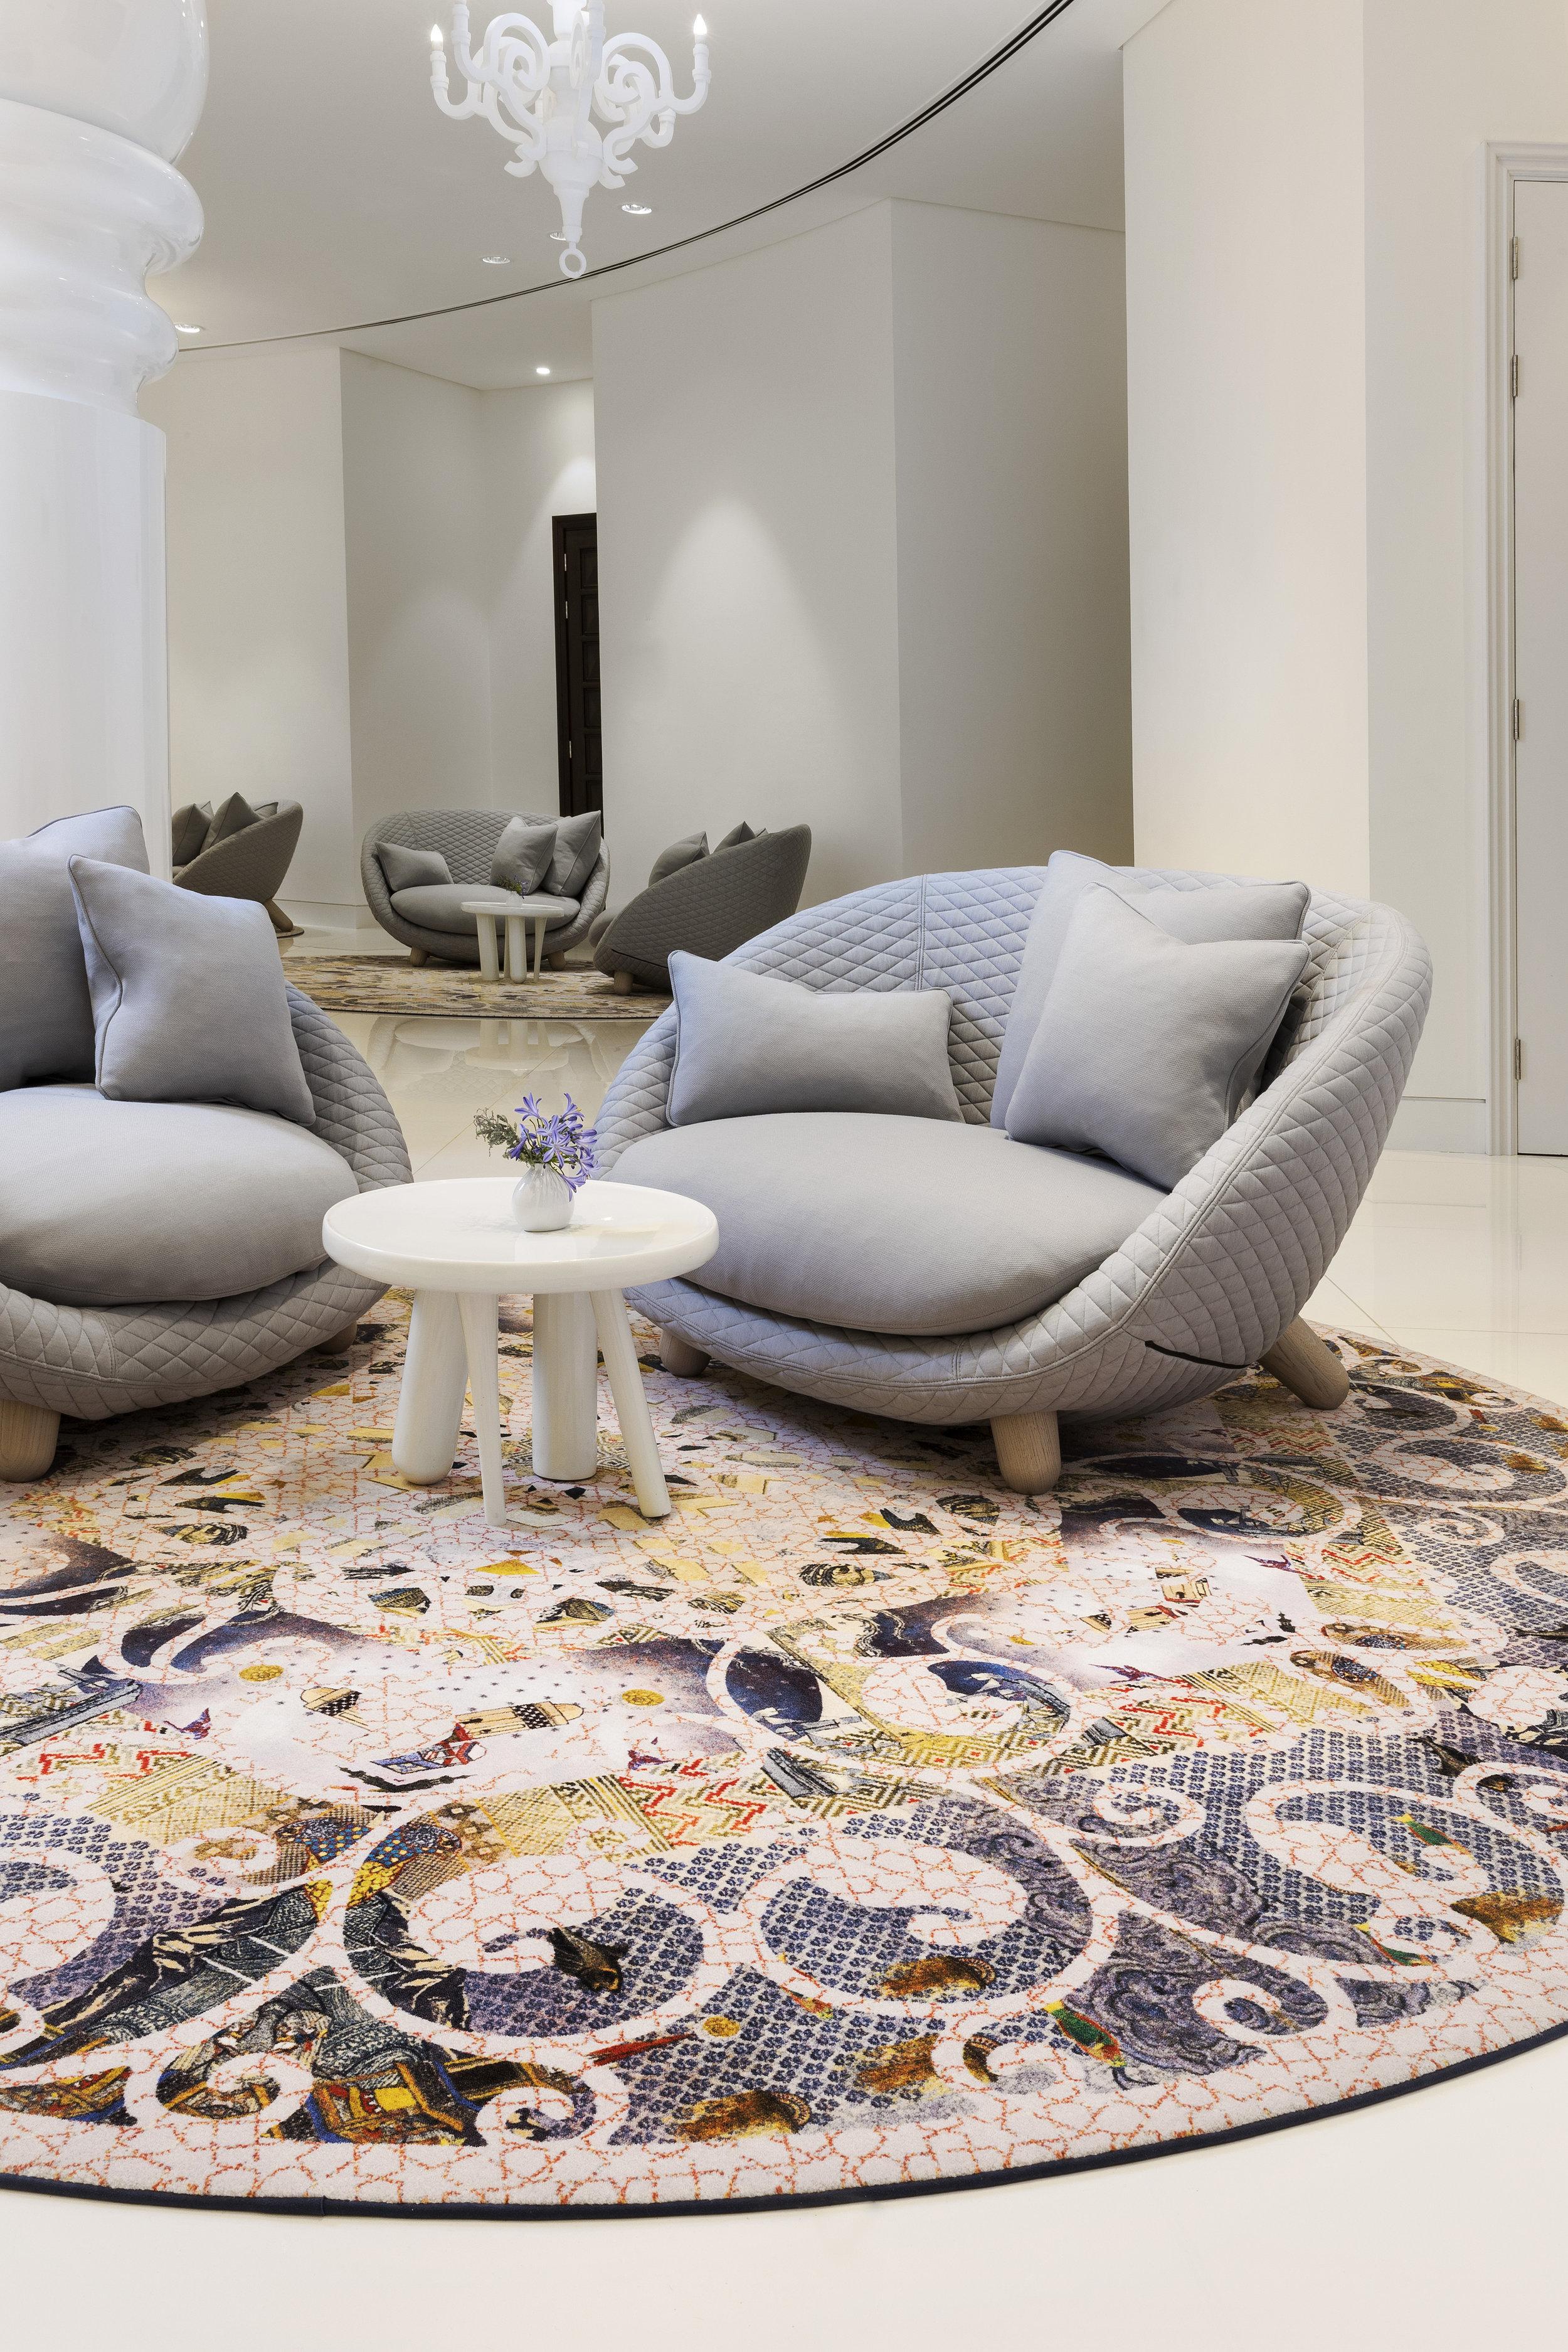 MW_MondrianDoha_businesslobby_03.jpg